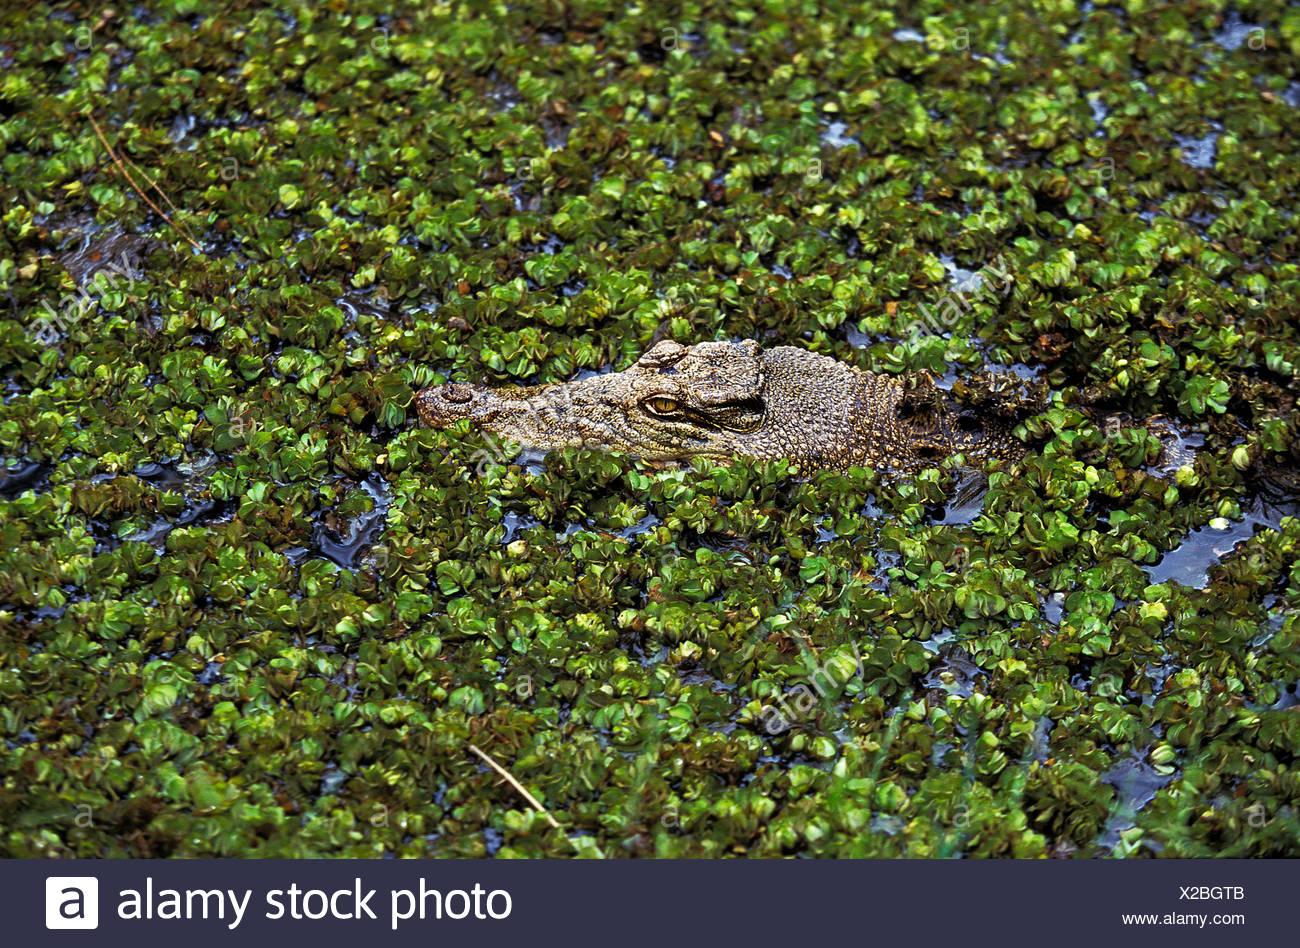 Australian Saltwater Crocodile or Estuarine Crocodile, crocodylus porosus, Adult camouflaged, Australia - Stock Image